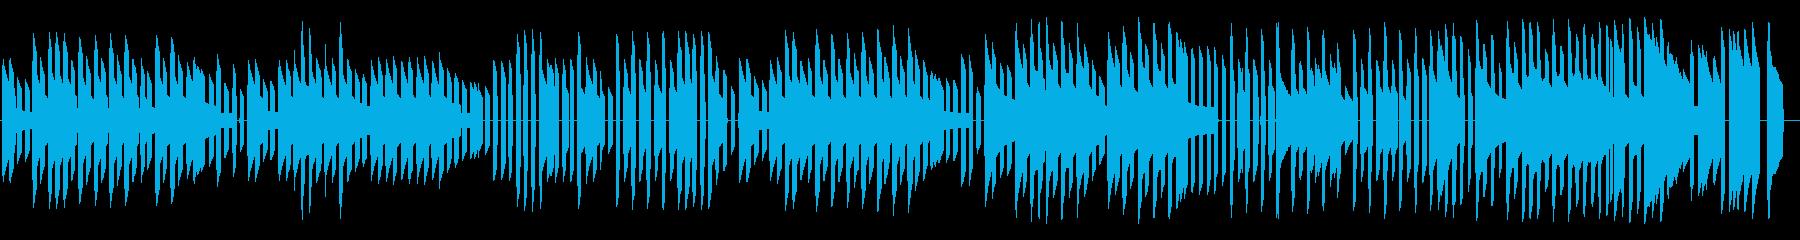 KANT お正月 ゲームサウンドの再生済みの波形